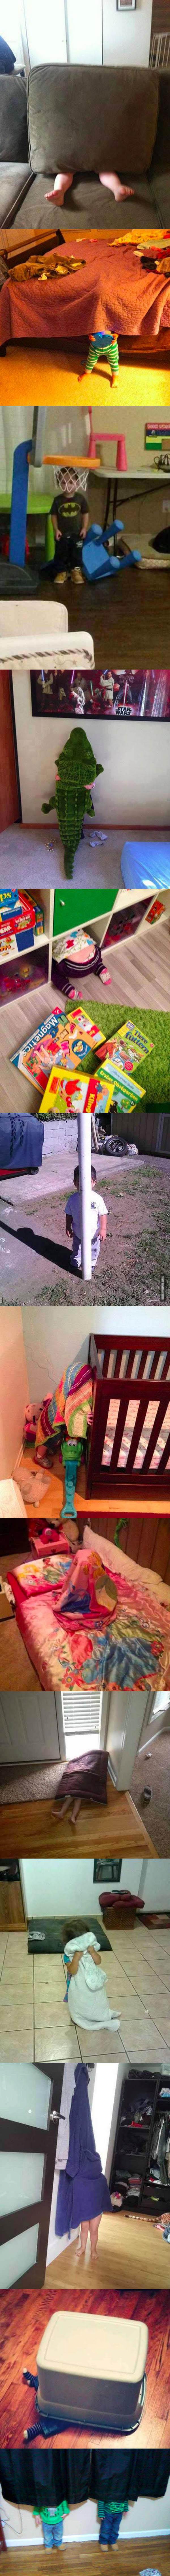 http://mohsenfarmani.persiangig.com/image/kids_hiding.jpg